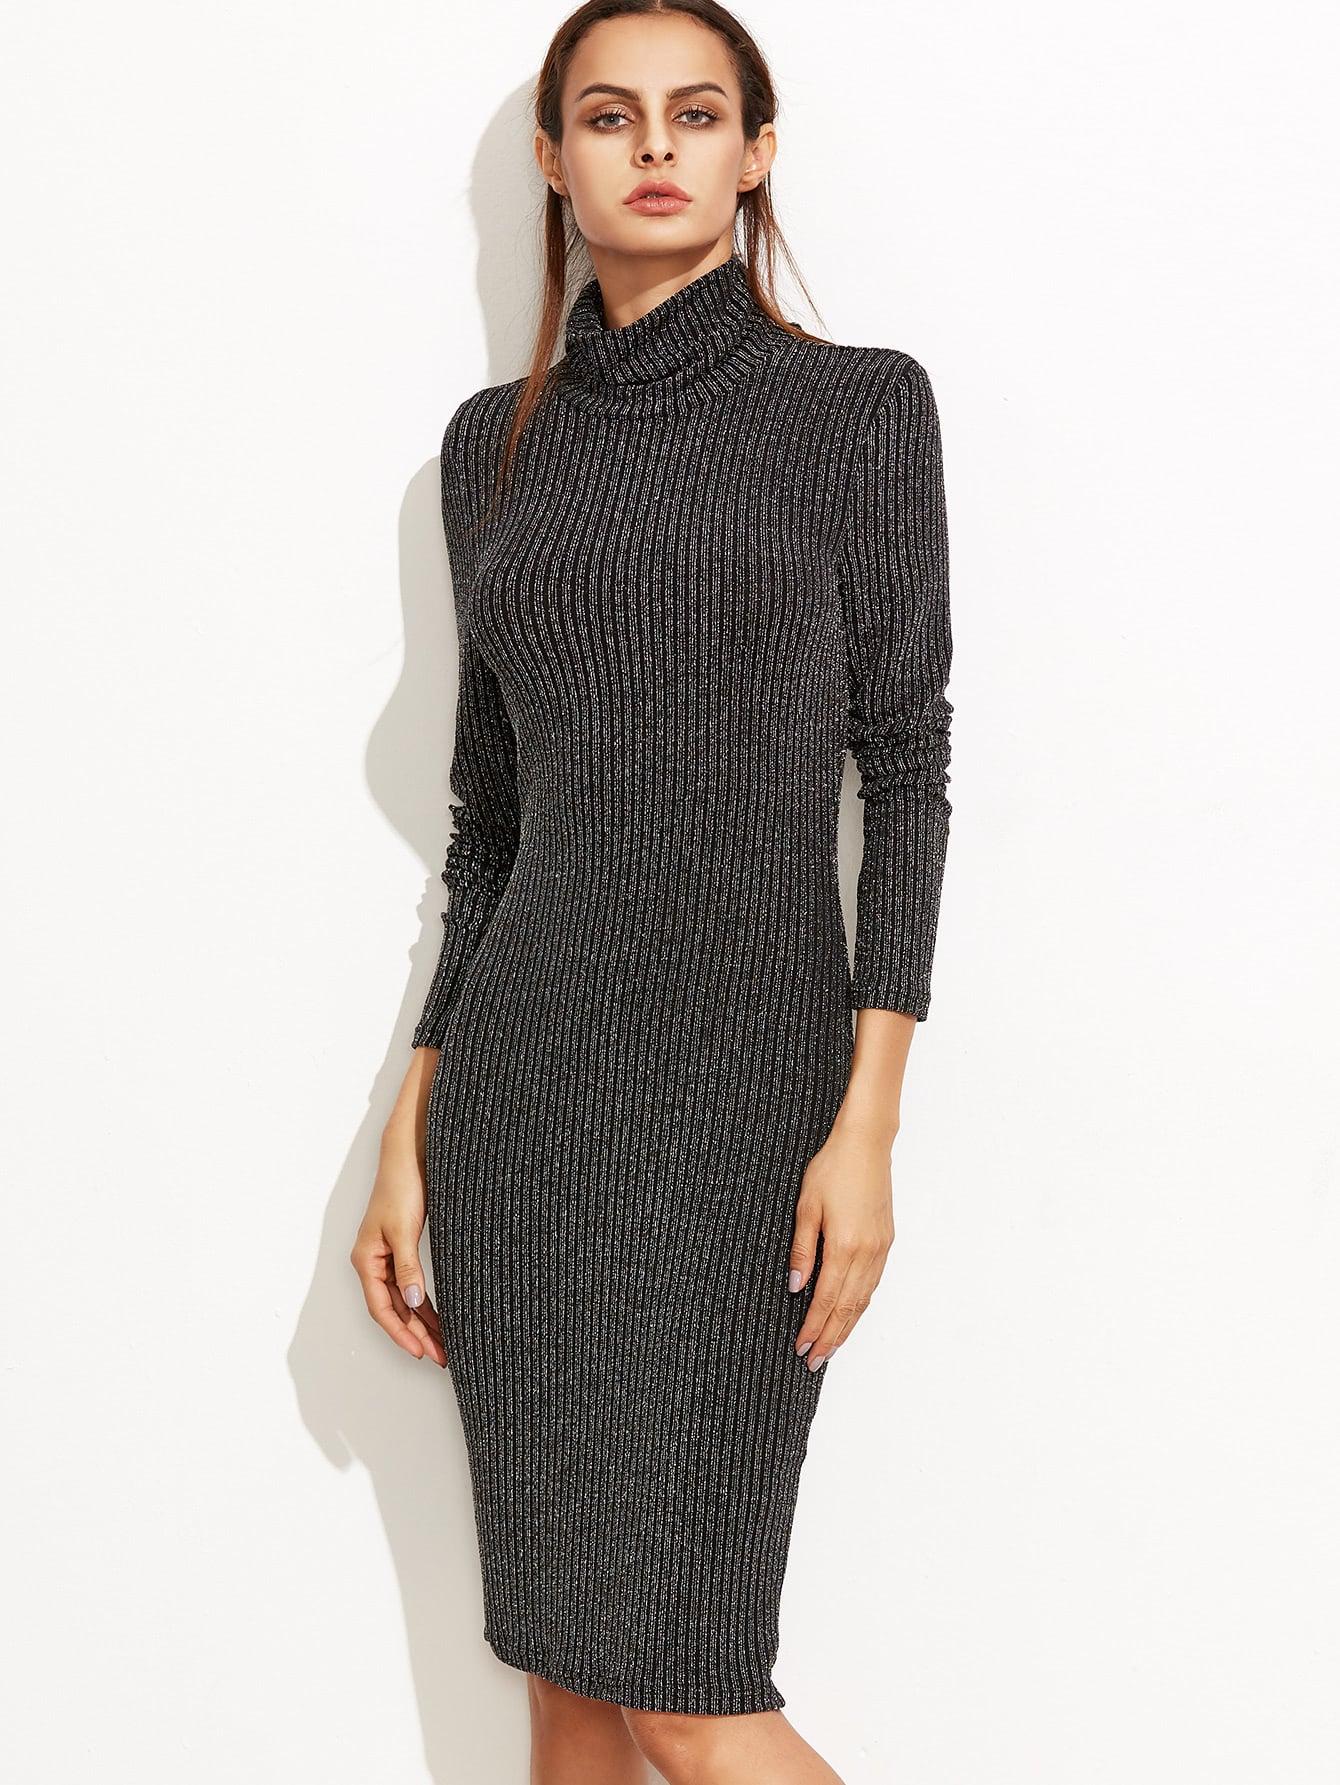 Marled Knit Cowl Neck Ribbed Pencil Dress dress161005706